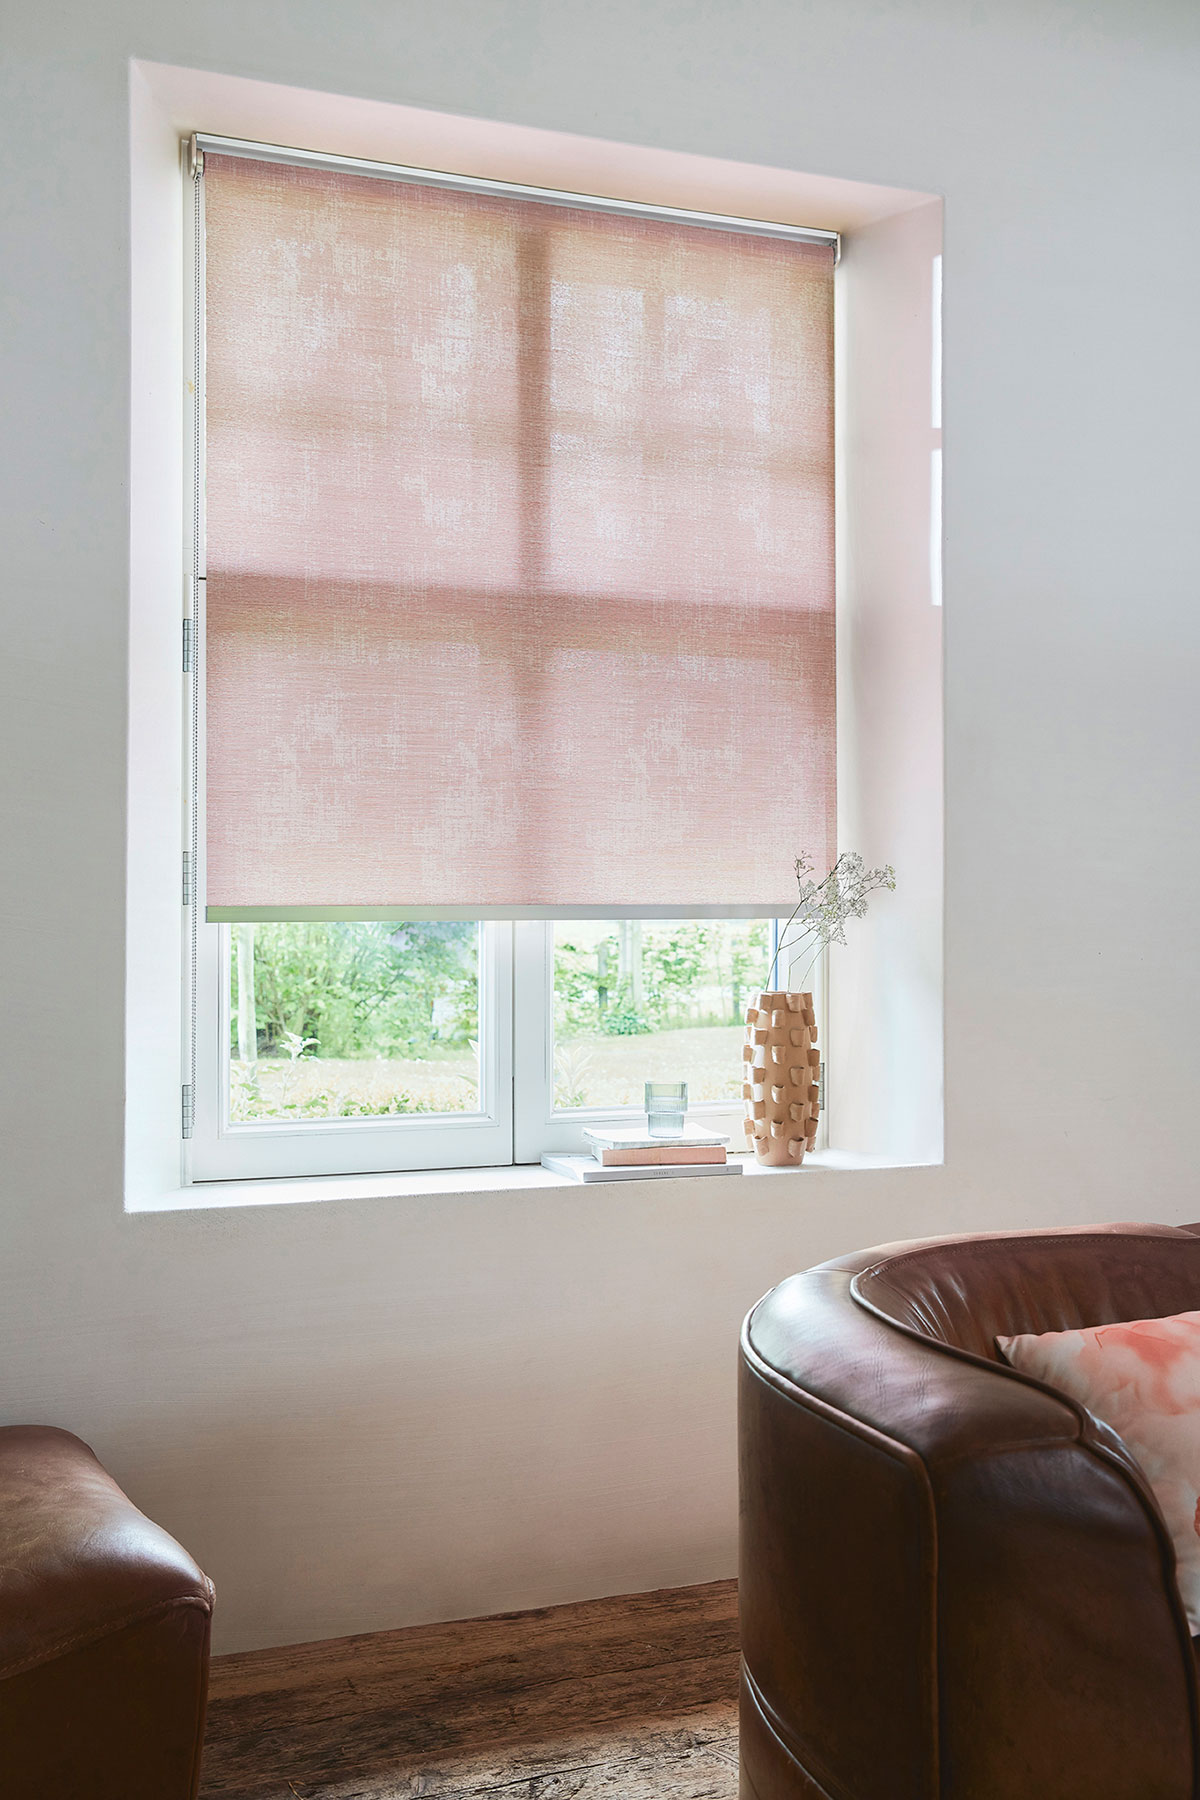 Store enrouleur pink Summer Haze ATENS CORAIL